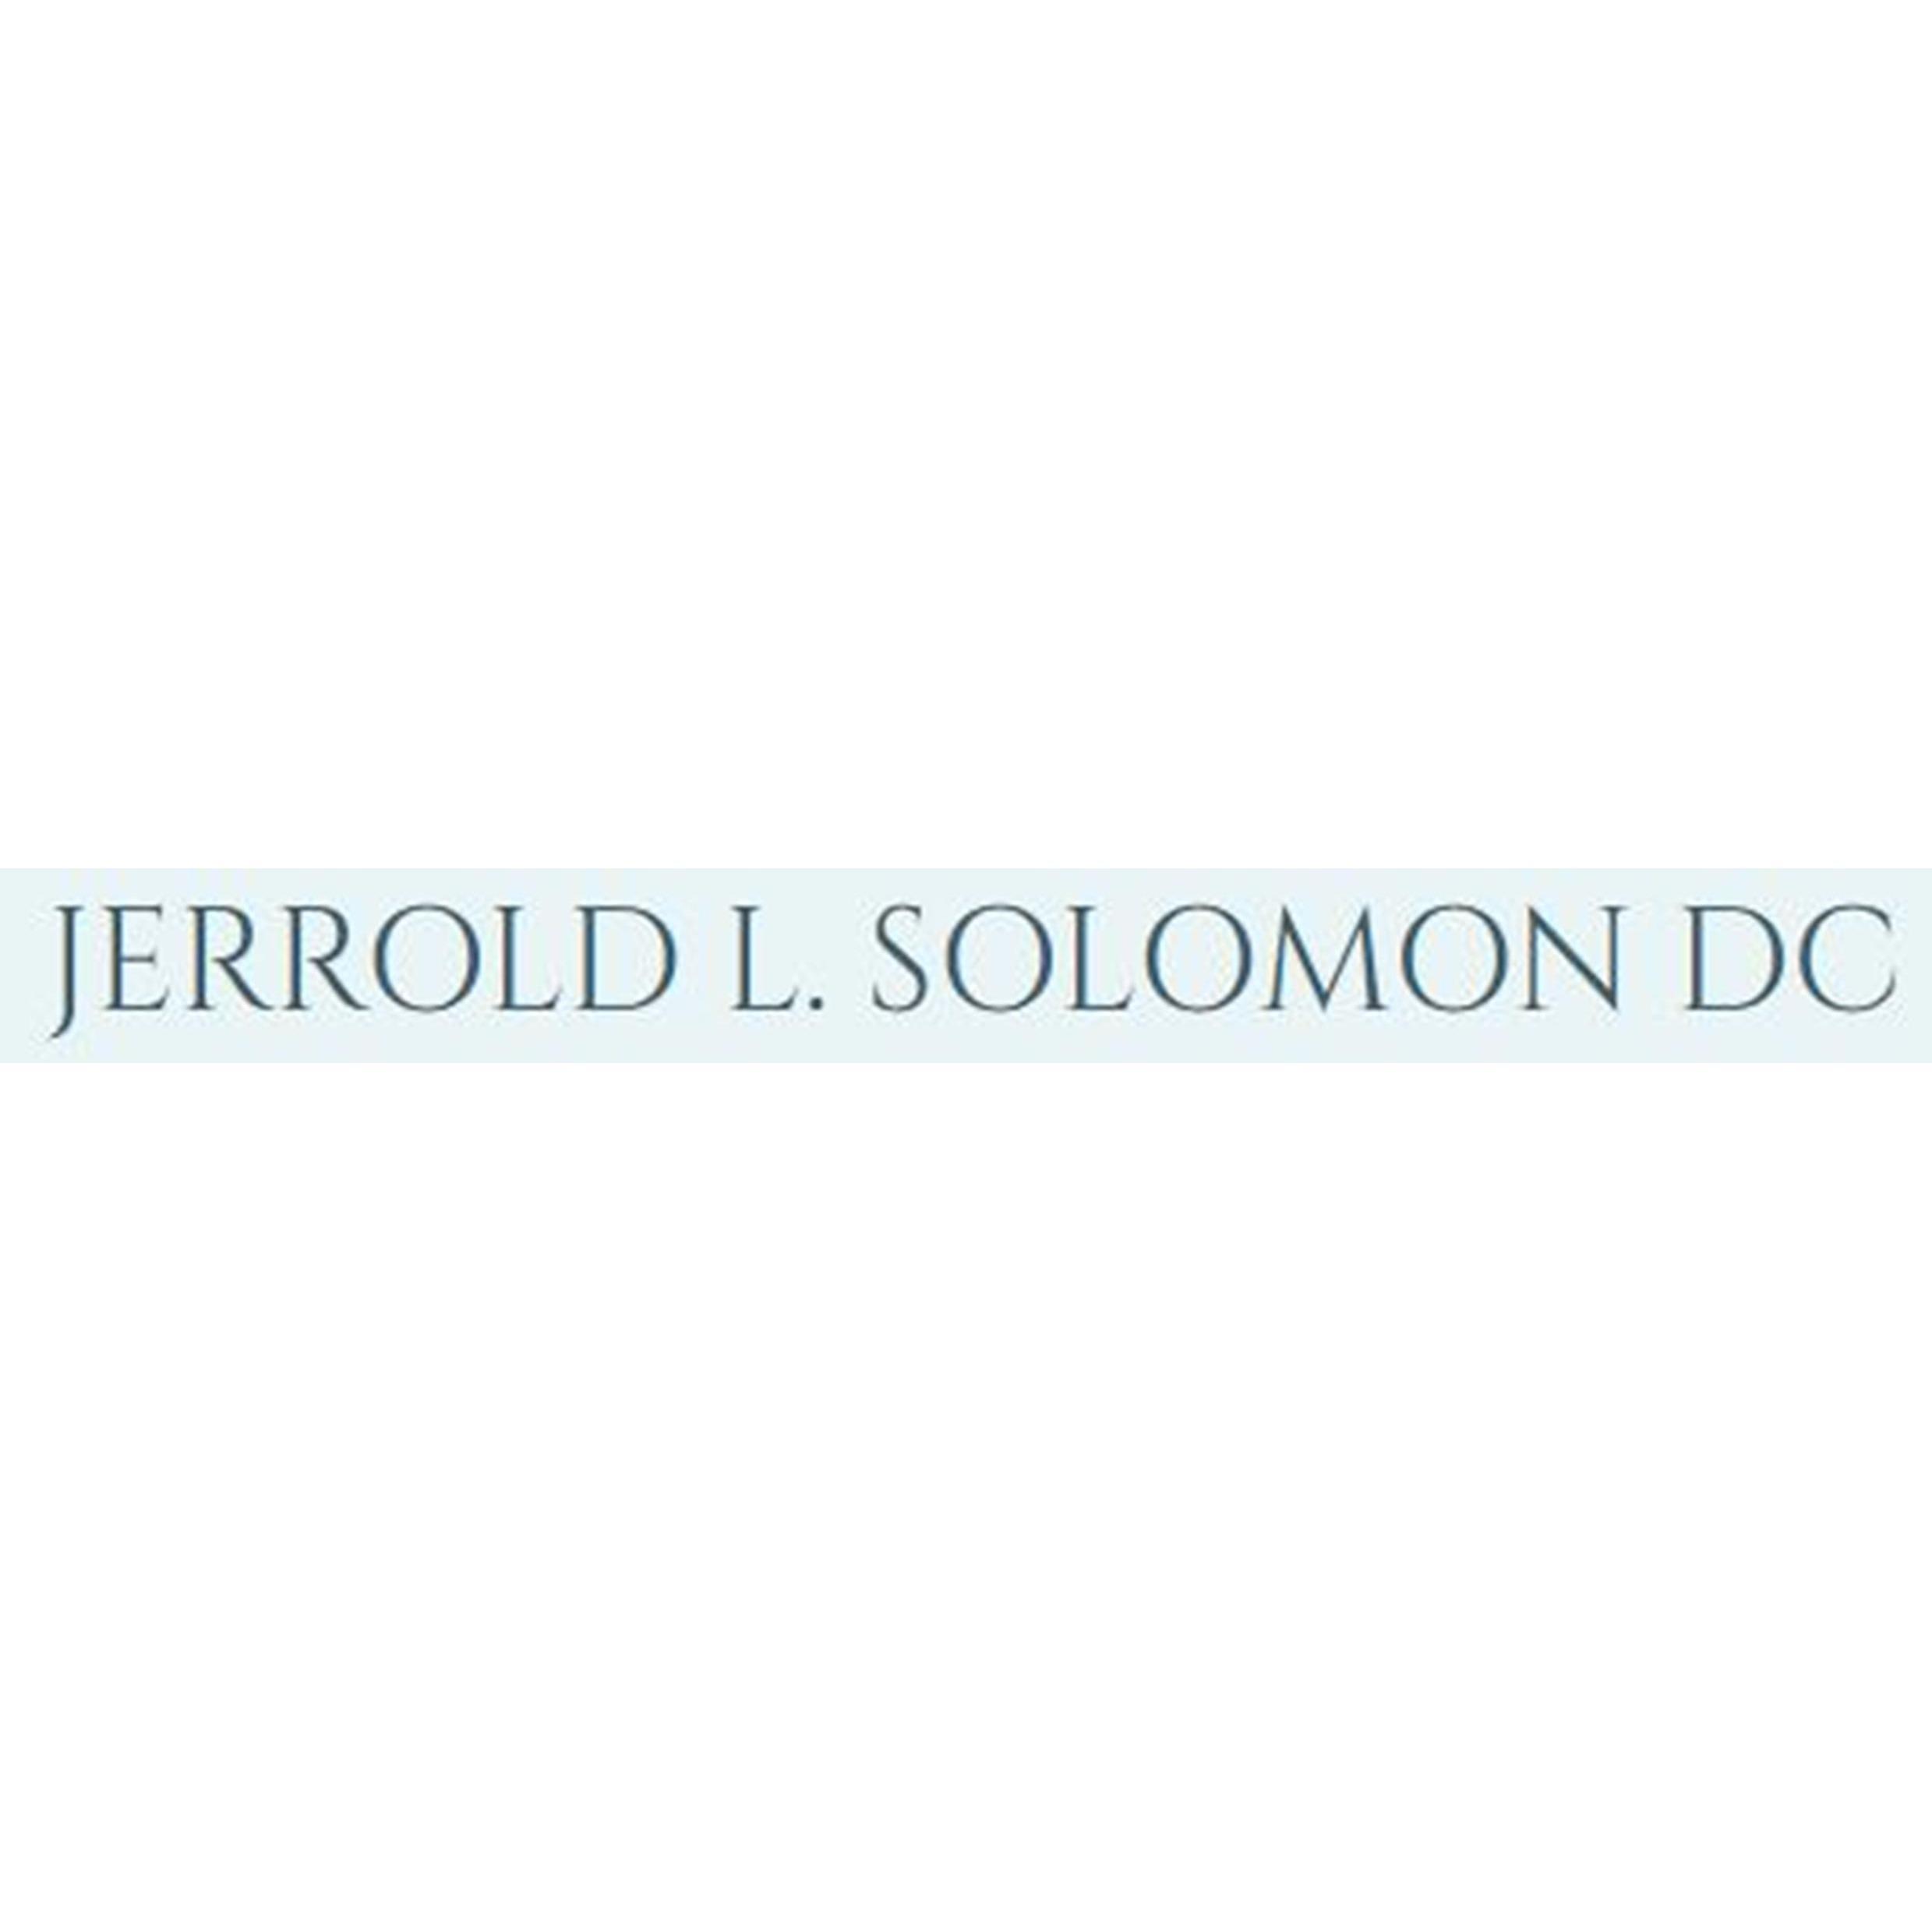 Jerrold L. Solomon D.C., INC. - Tiffin, OH - Chiropractors